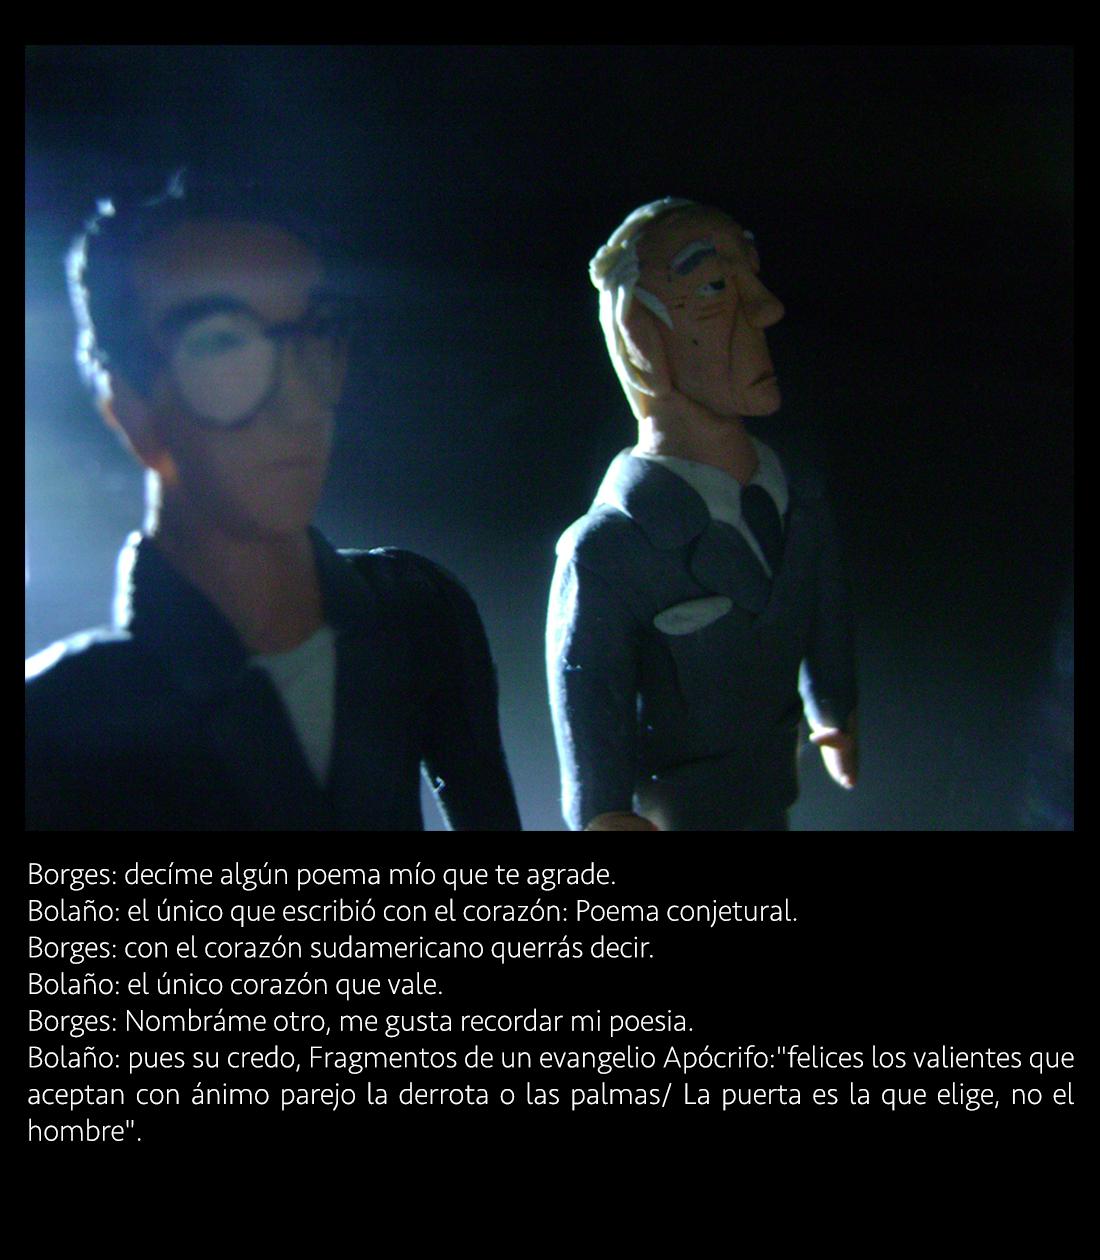 Borges Bolaño 07